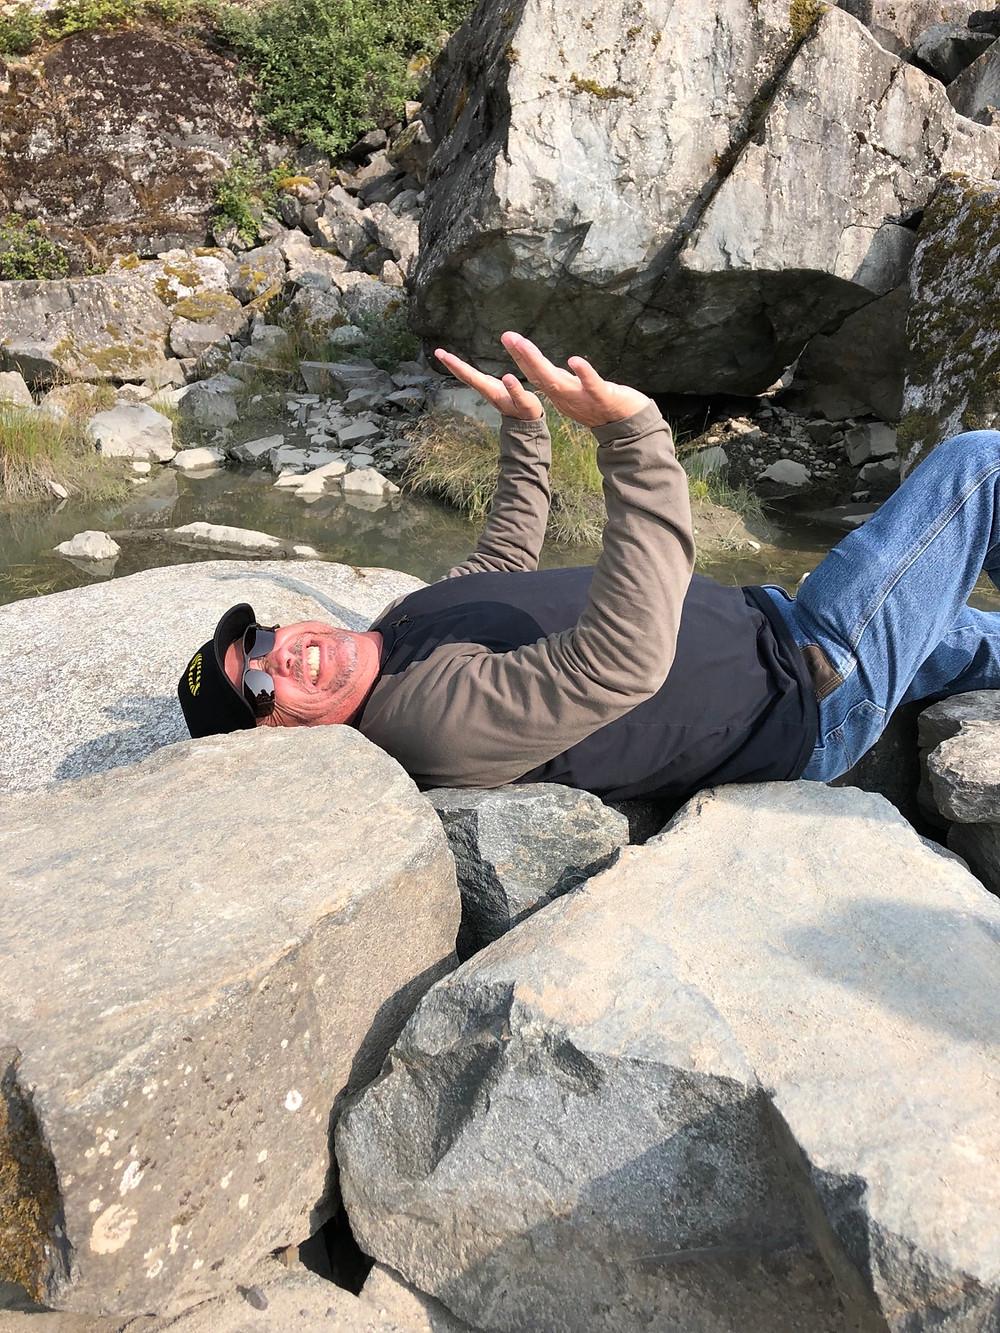 Man pretending to be pushing off a boulder